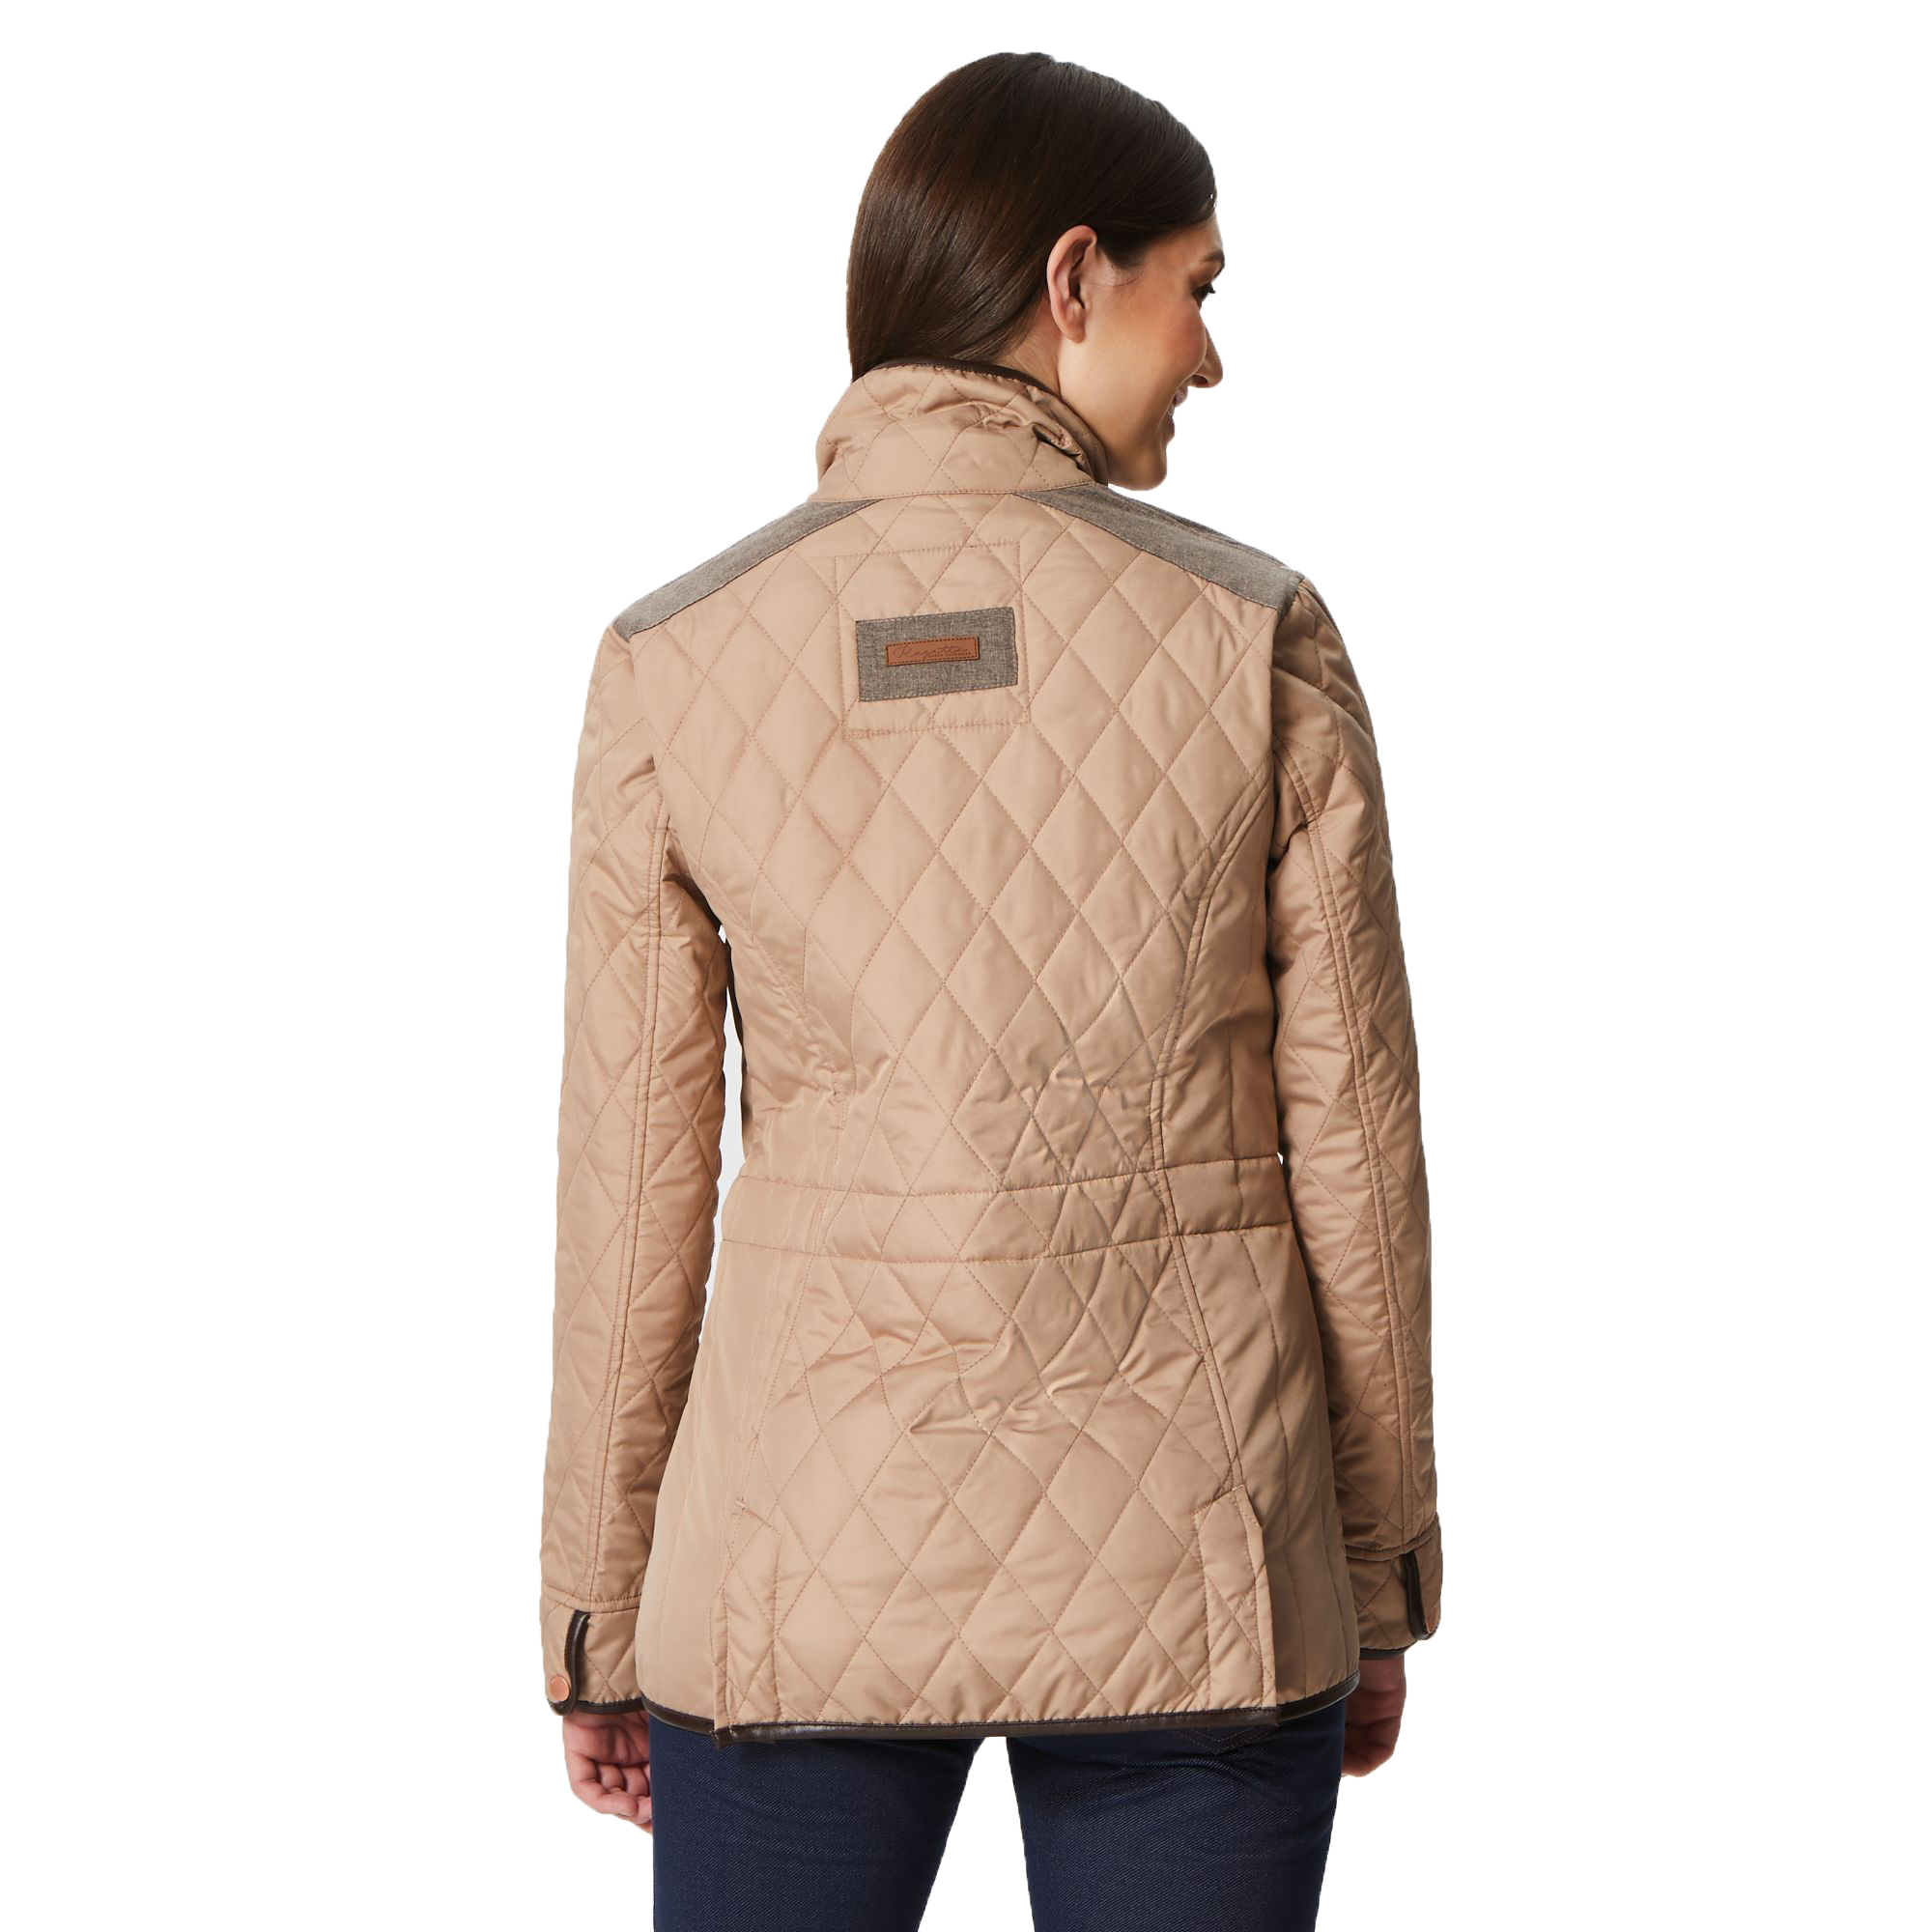 Regatta-Coretta-Women-039-s-Quilted-Water-Repellent-Insulated-Jacket thumbnail 6